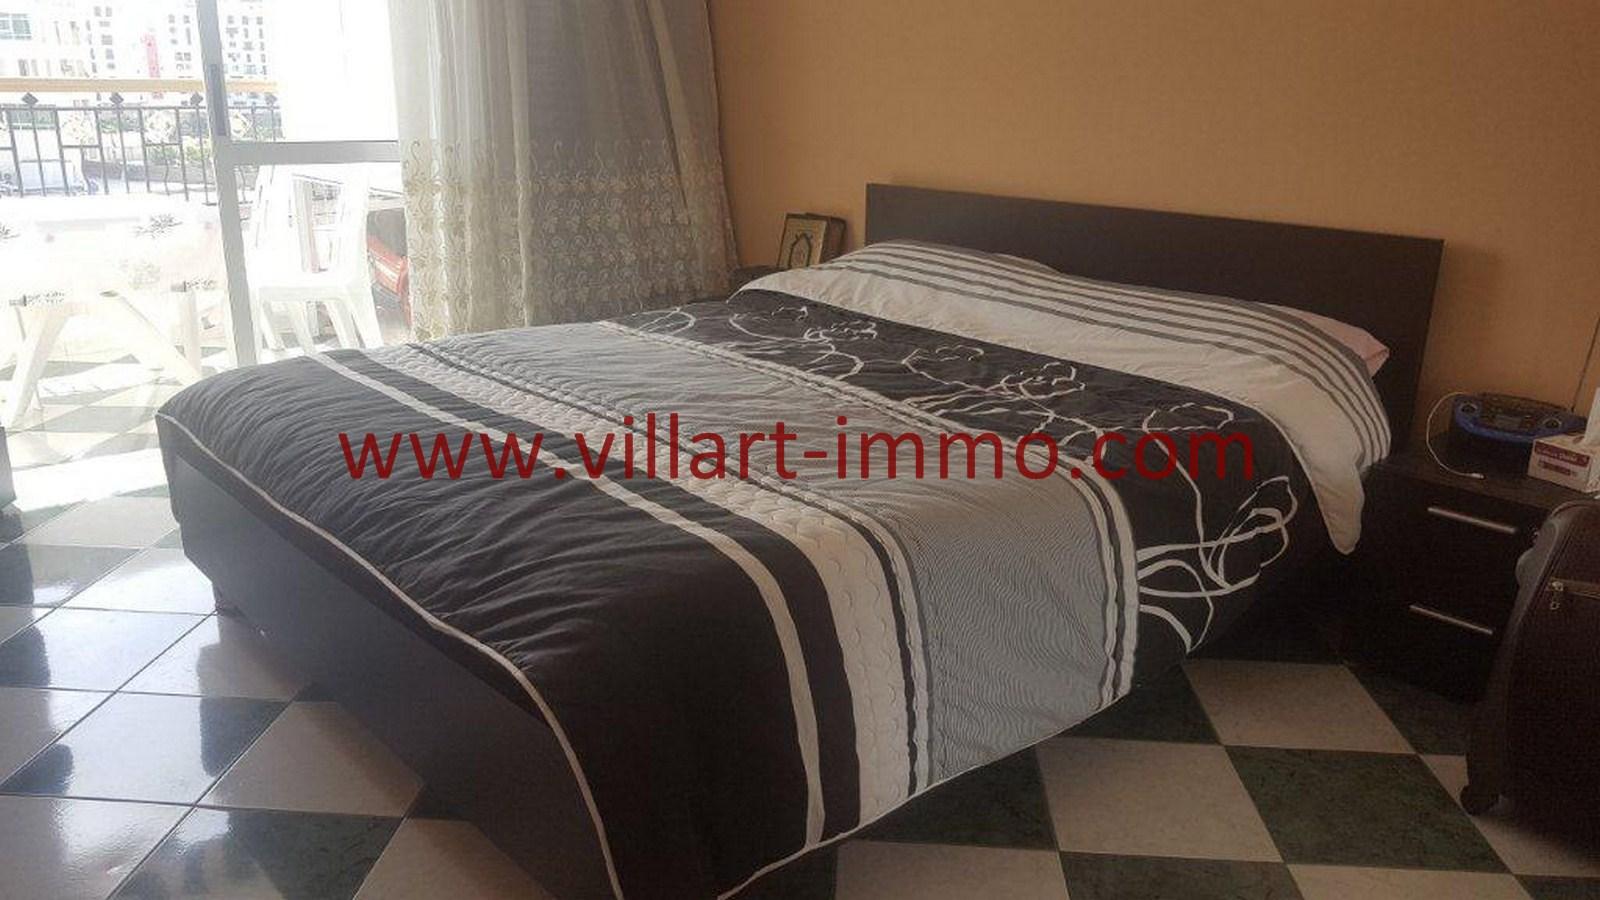 5-Vente-Appartement-Tanger-Malabata-Chambre-à-coucher-VA507-Villart Immo